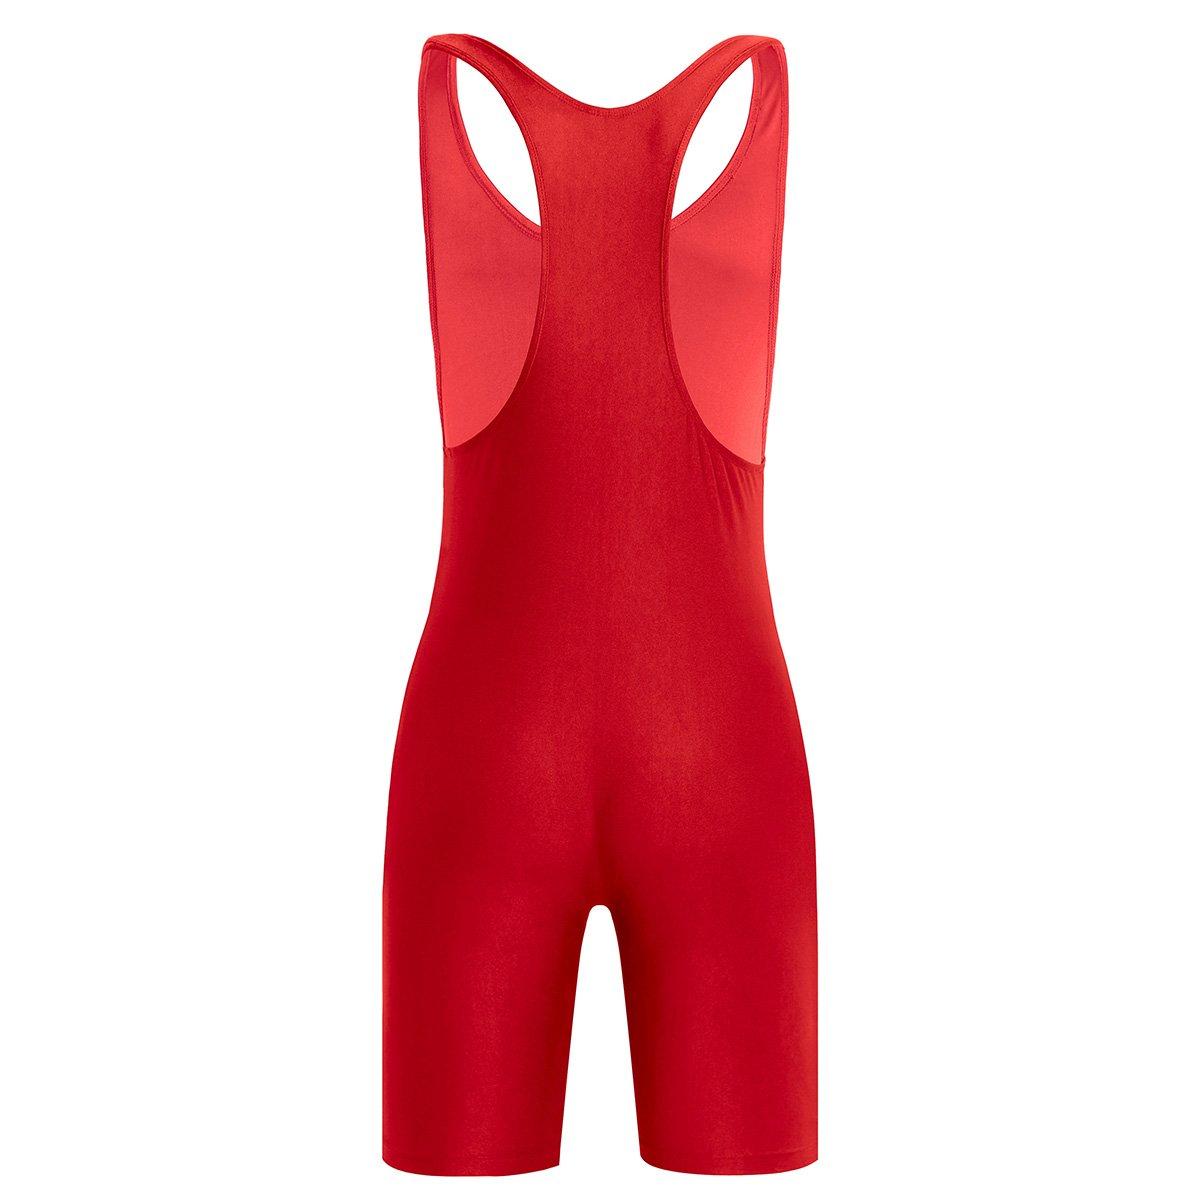 CHICTRY Mens Lycra Solid Modified Singlet Wrestling Bodysuit Underwear